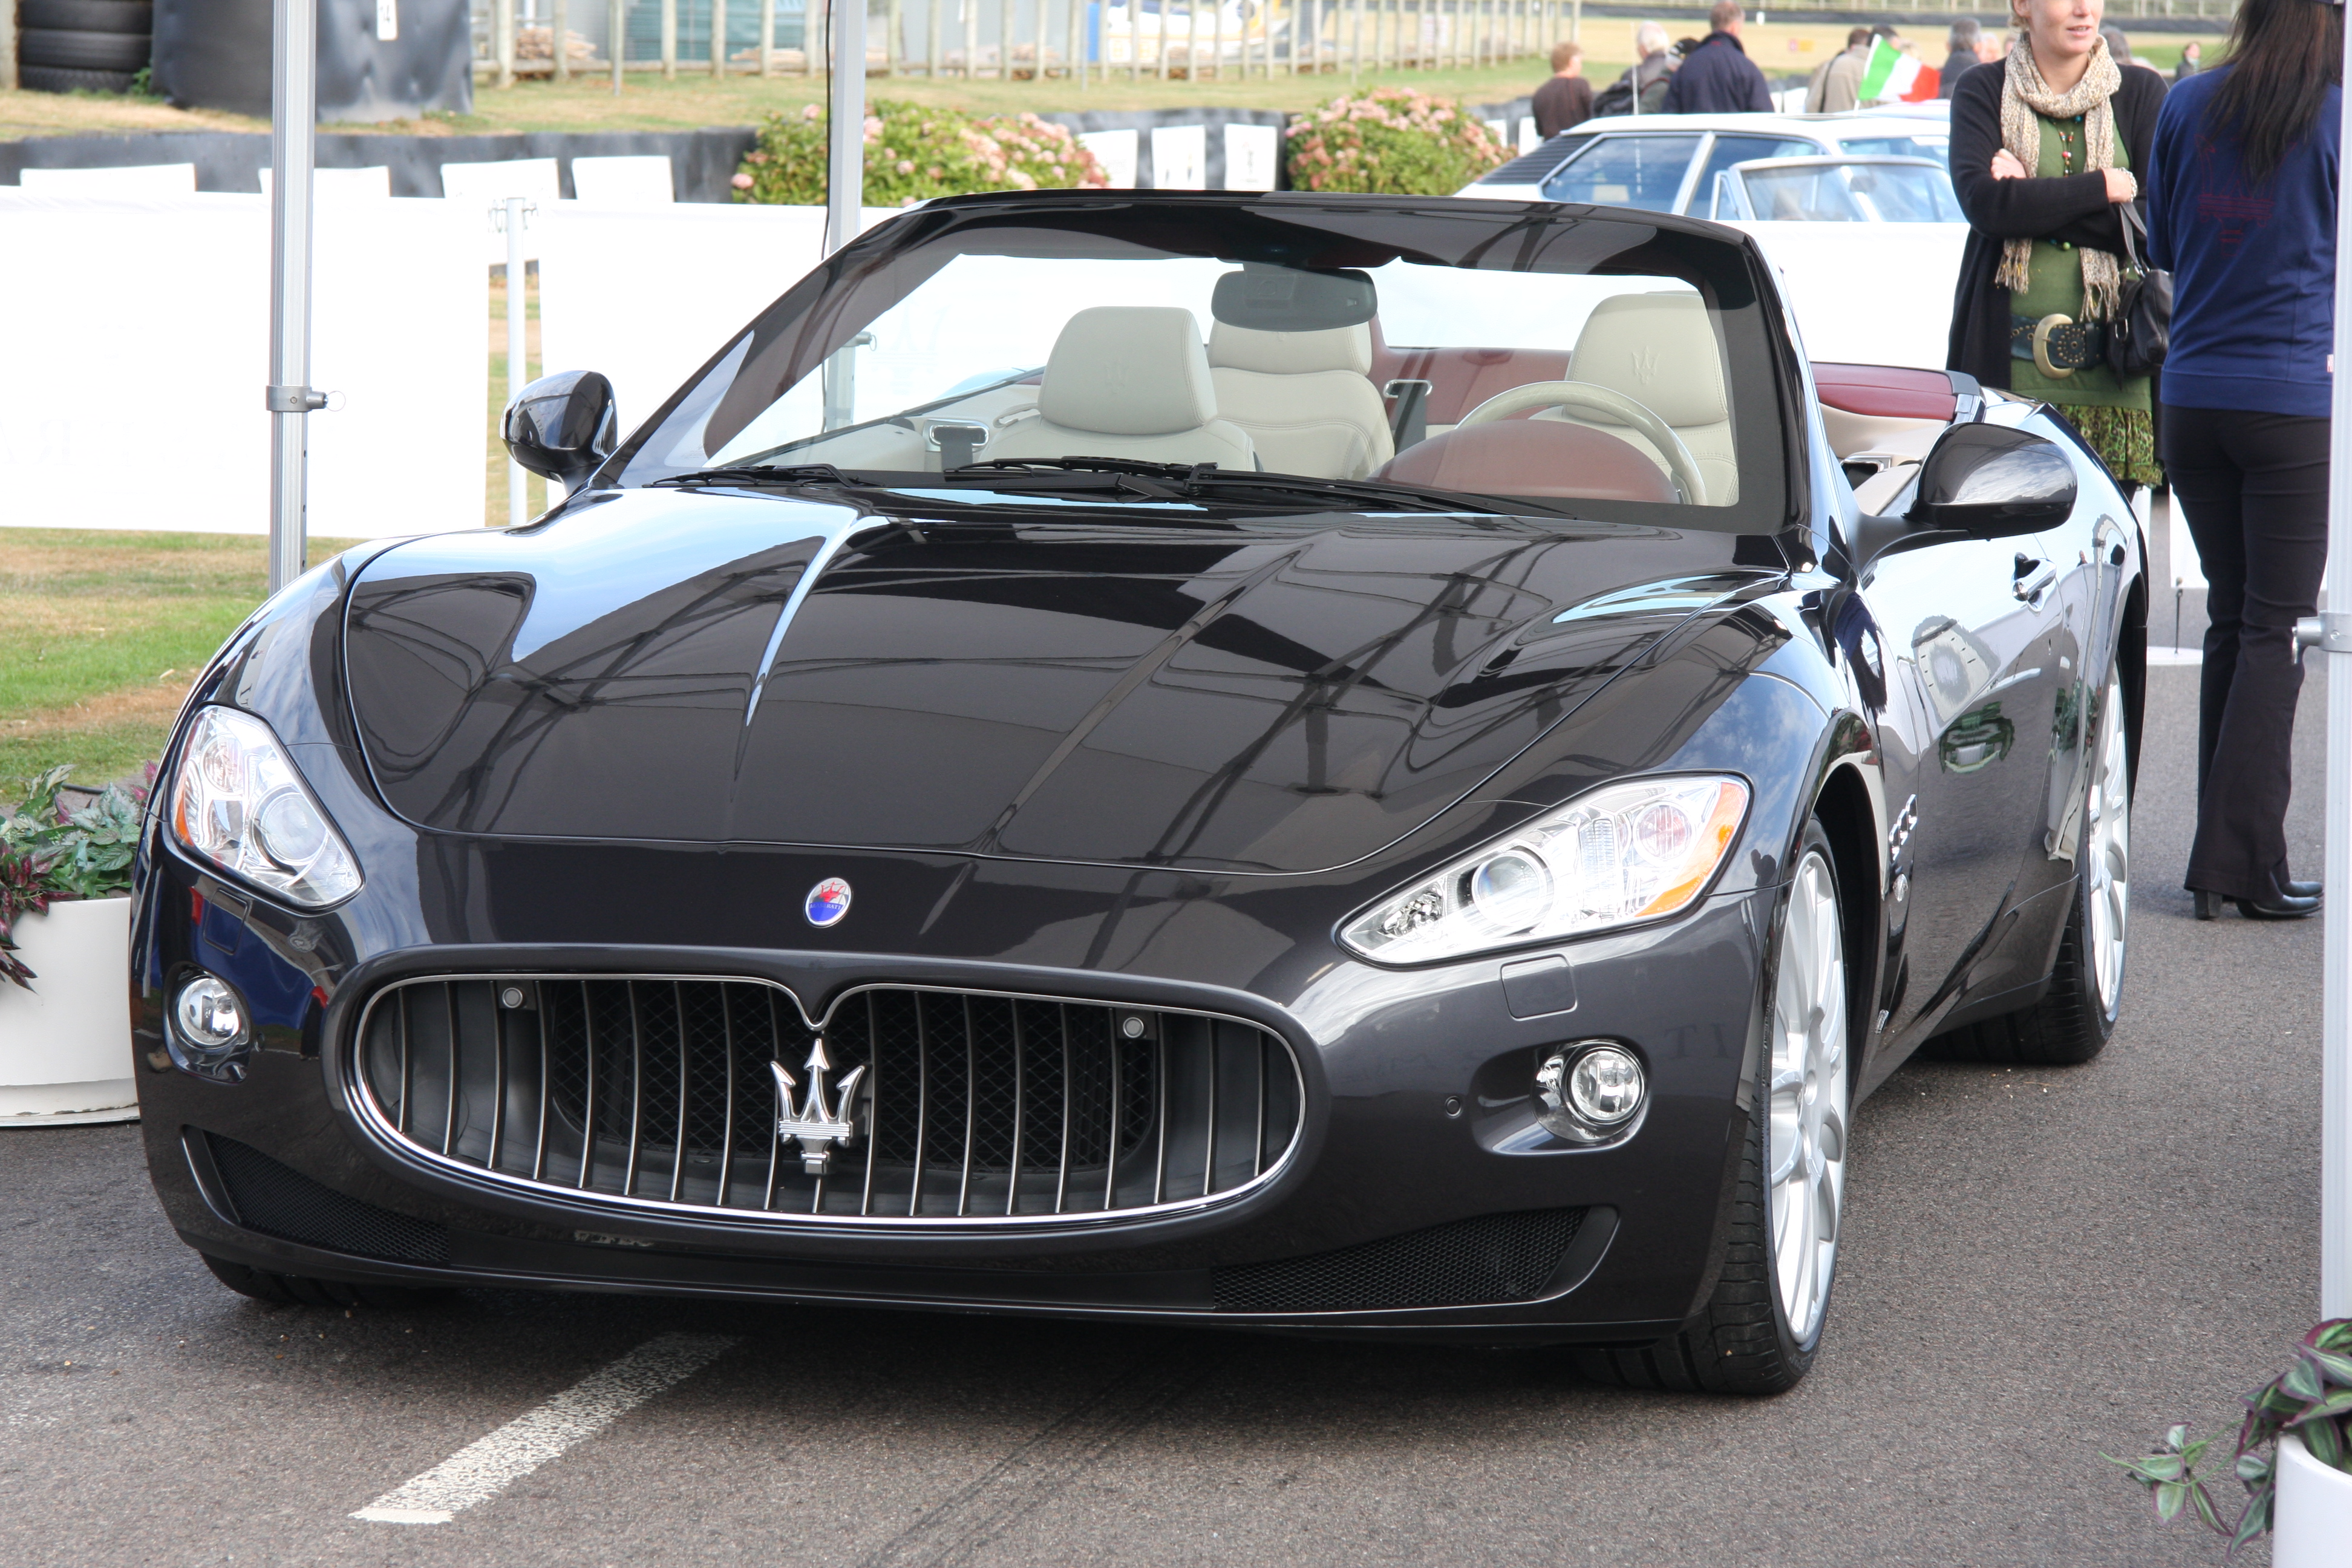 Maserati Gran Cabrio Goodwood Pictures Photos Images Desktop Download